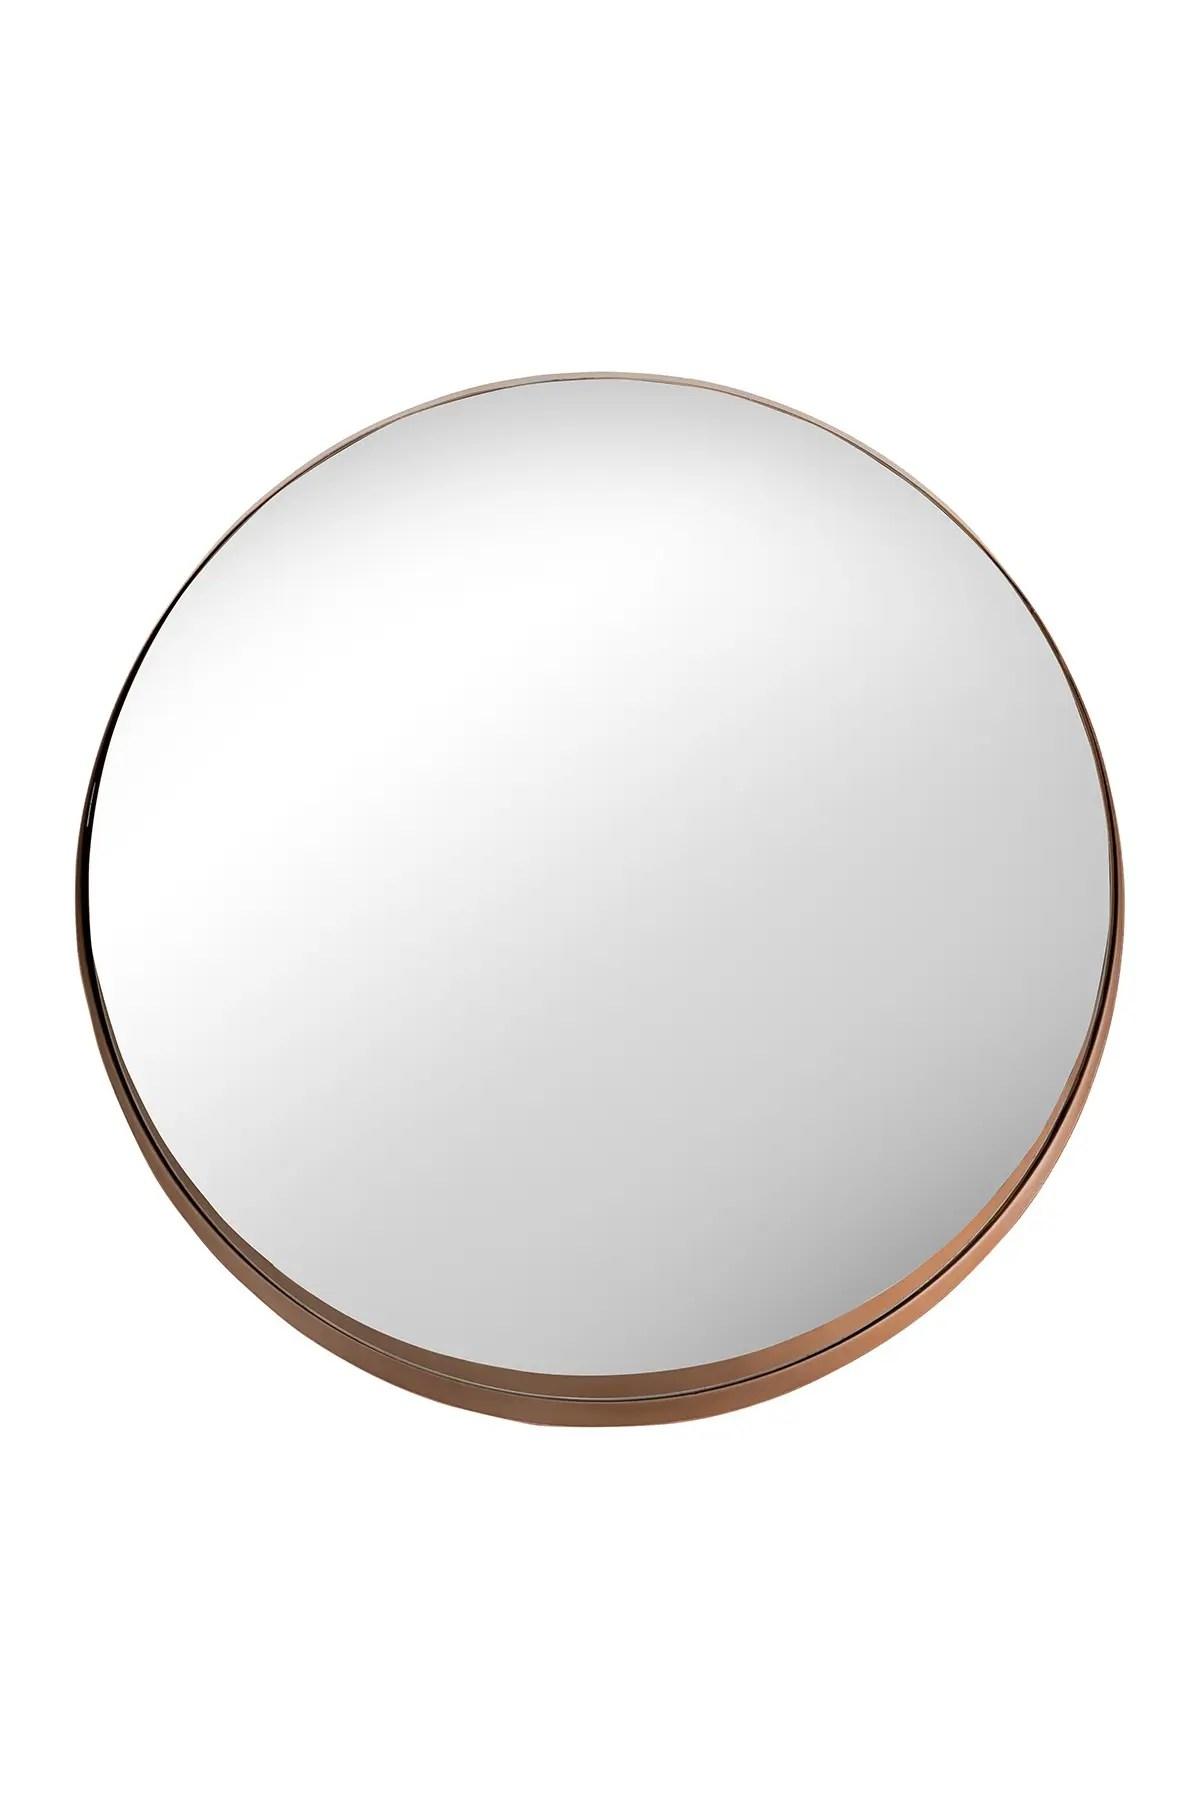 tov furniture jamie mirror nordstrom rack